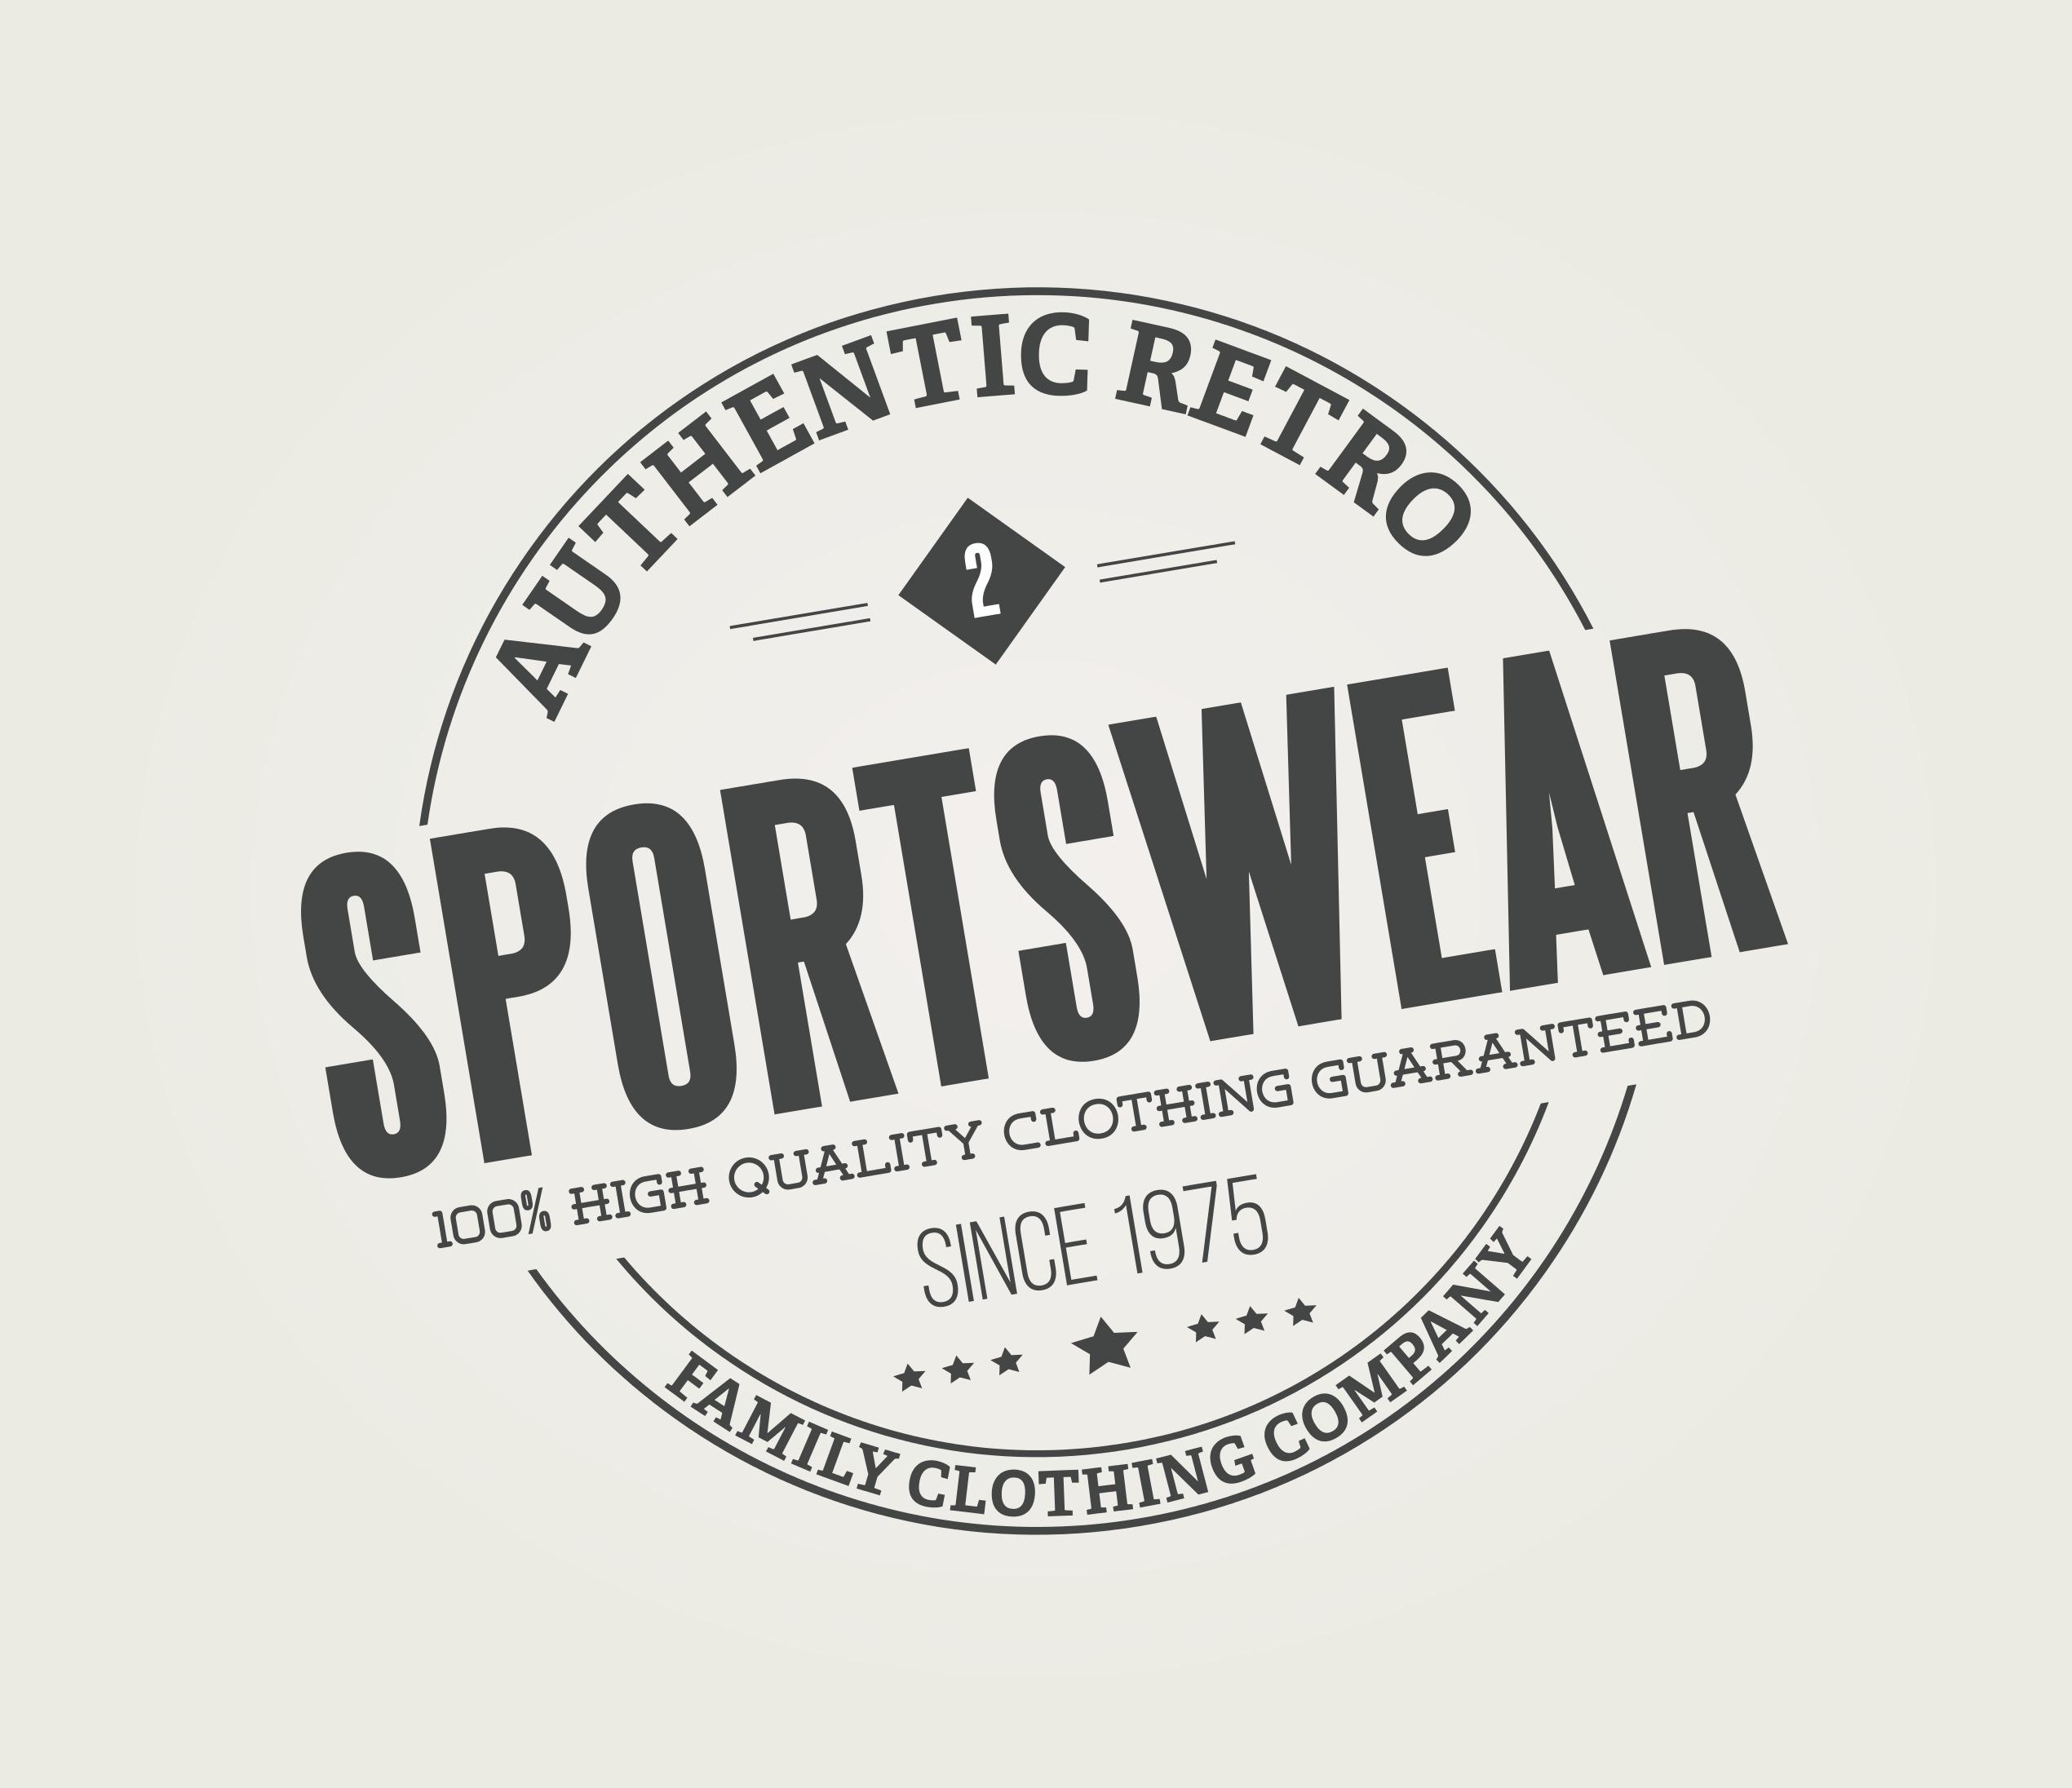 vintage logo badge template download free vector art stock